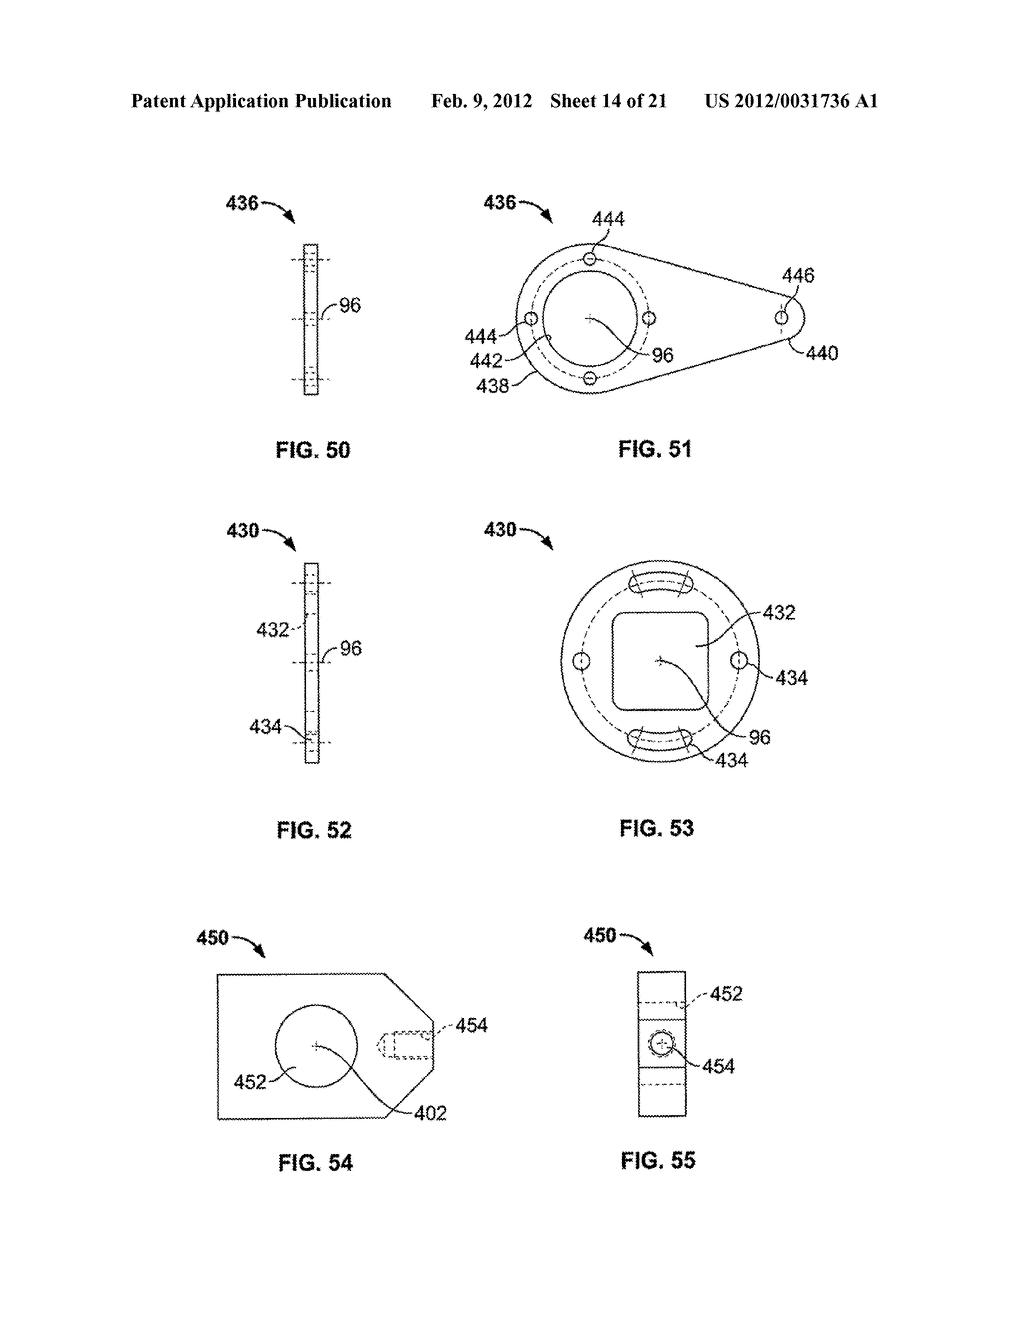 hight resolution of method of adjusting conveyor belt scrapers and open loop control system for conveyor belt scrapers diagram schematic and image 15